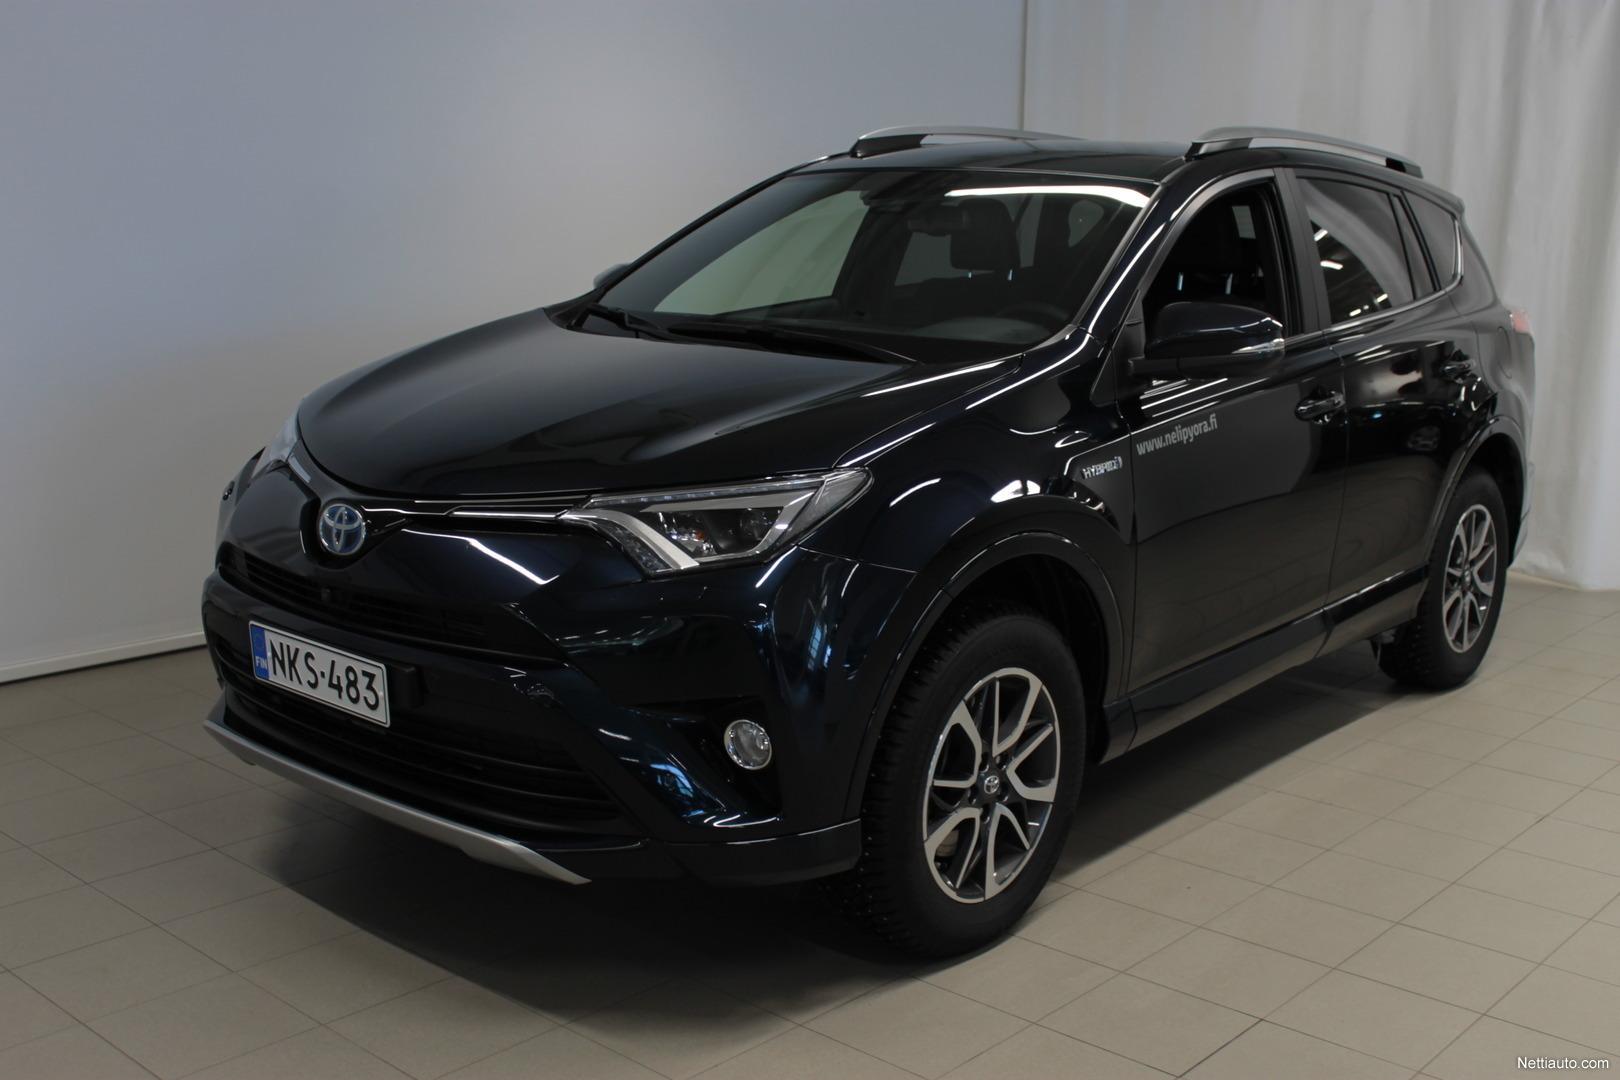 toyota rav4 2 5 hybrid awd style 4x4 2018 used vehicle nettiauto. Black Bedroom Furniture Sets. Home Design Ideas